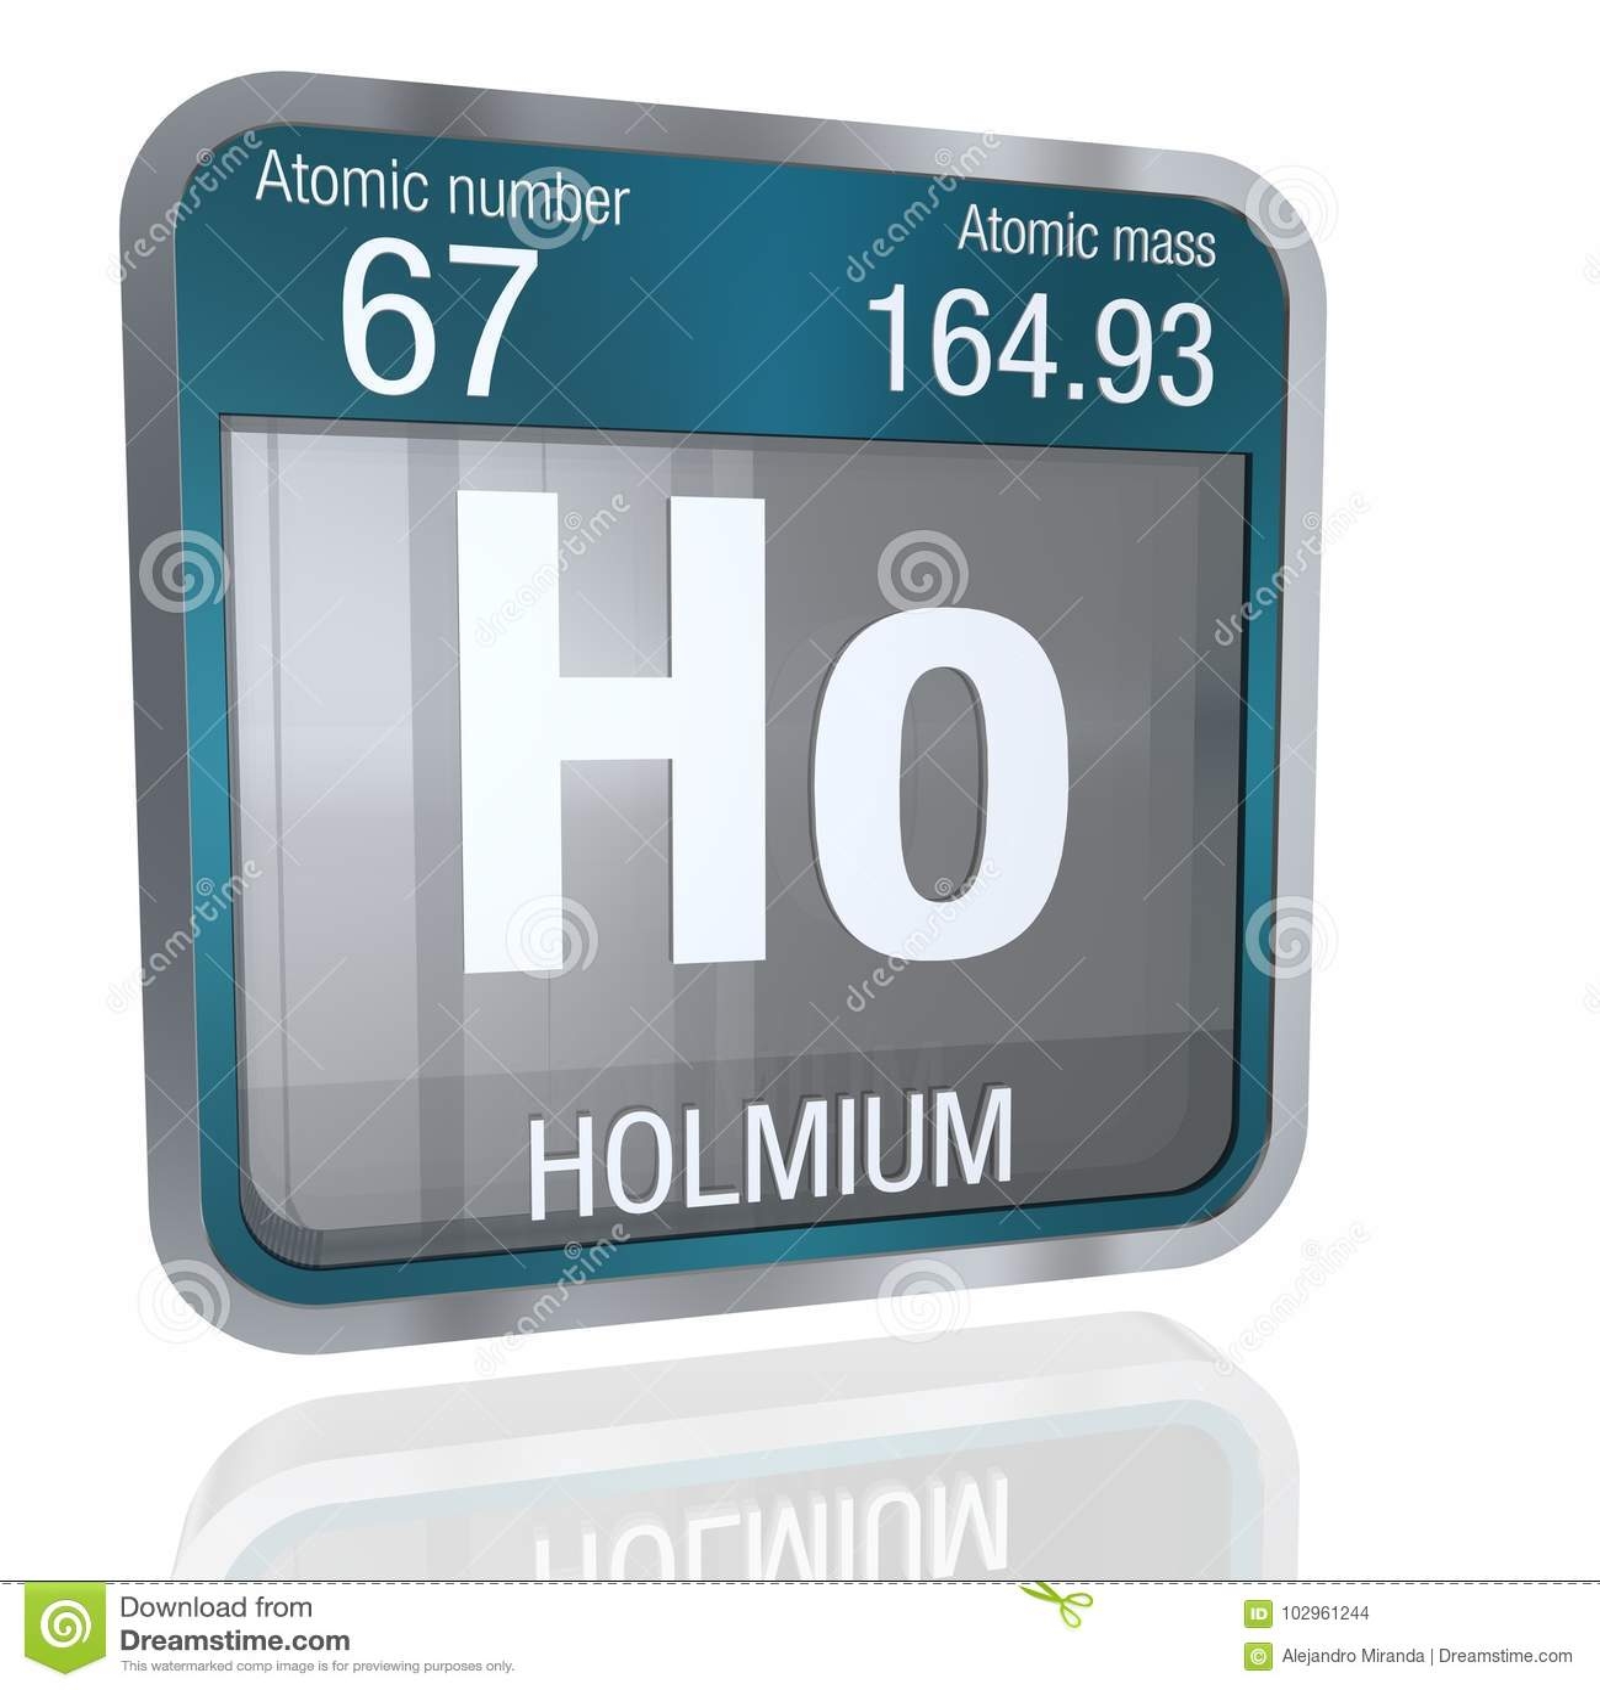 Holmium Symbol In Square Shape With Metallic Border And Transparent